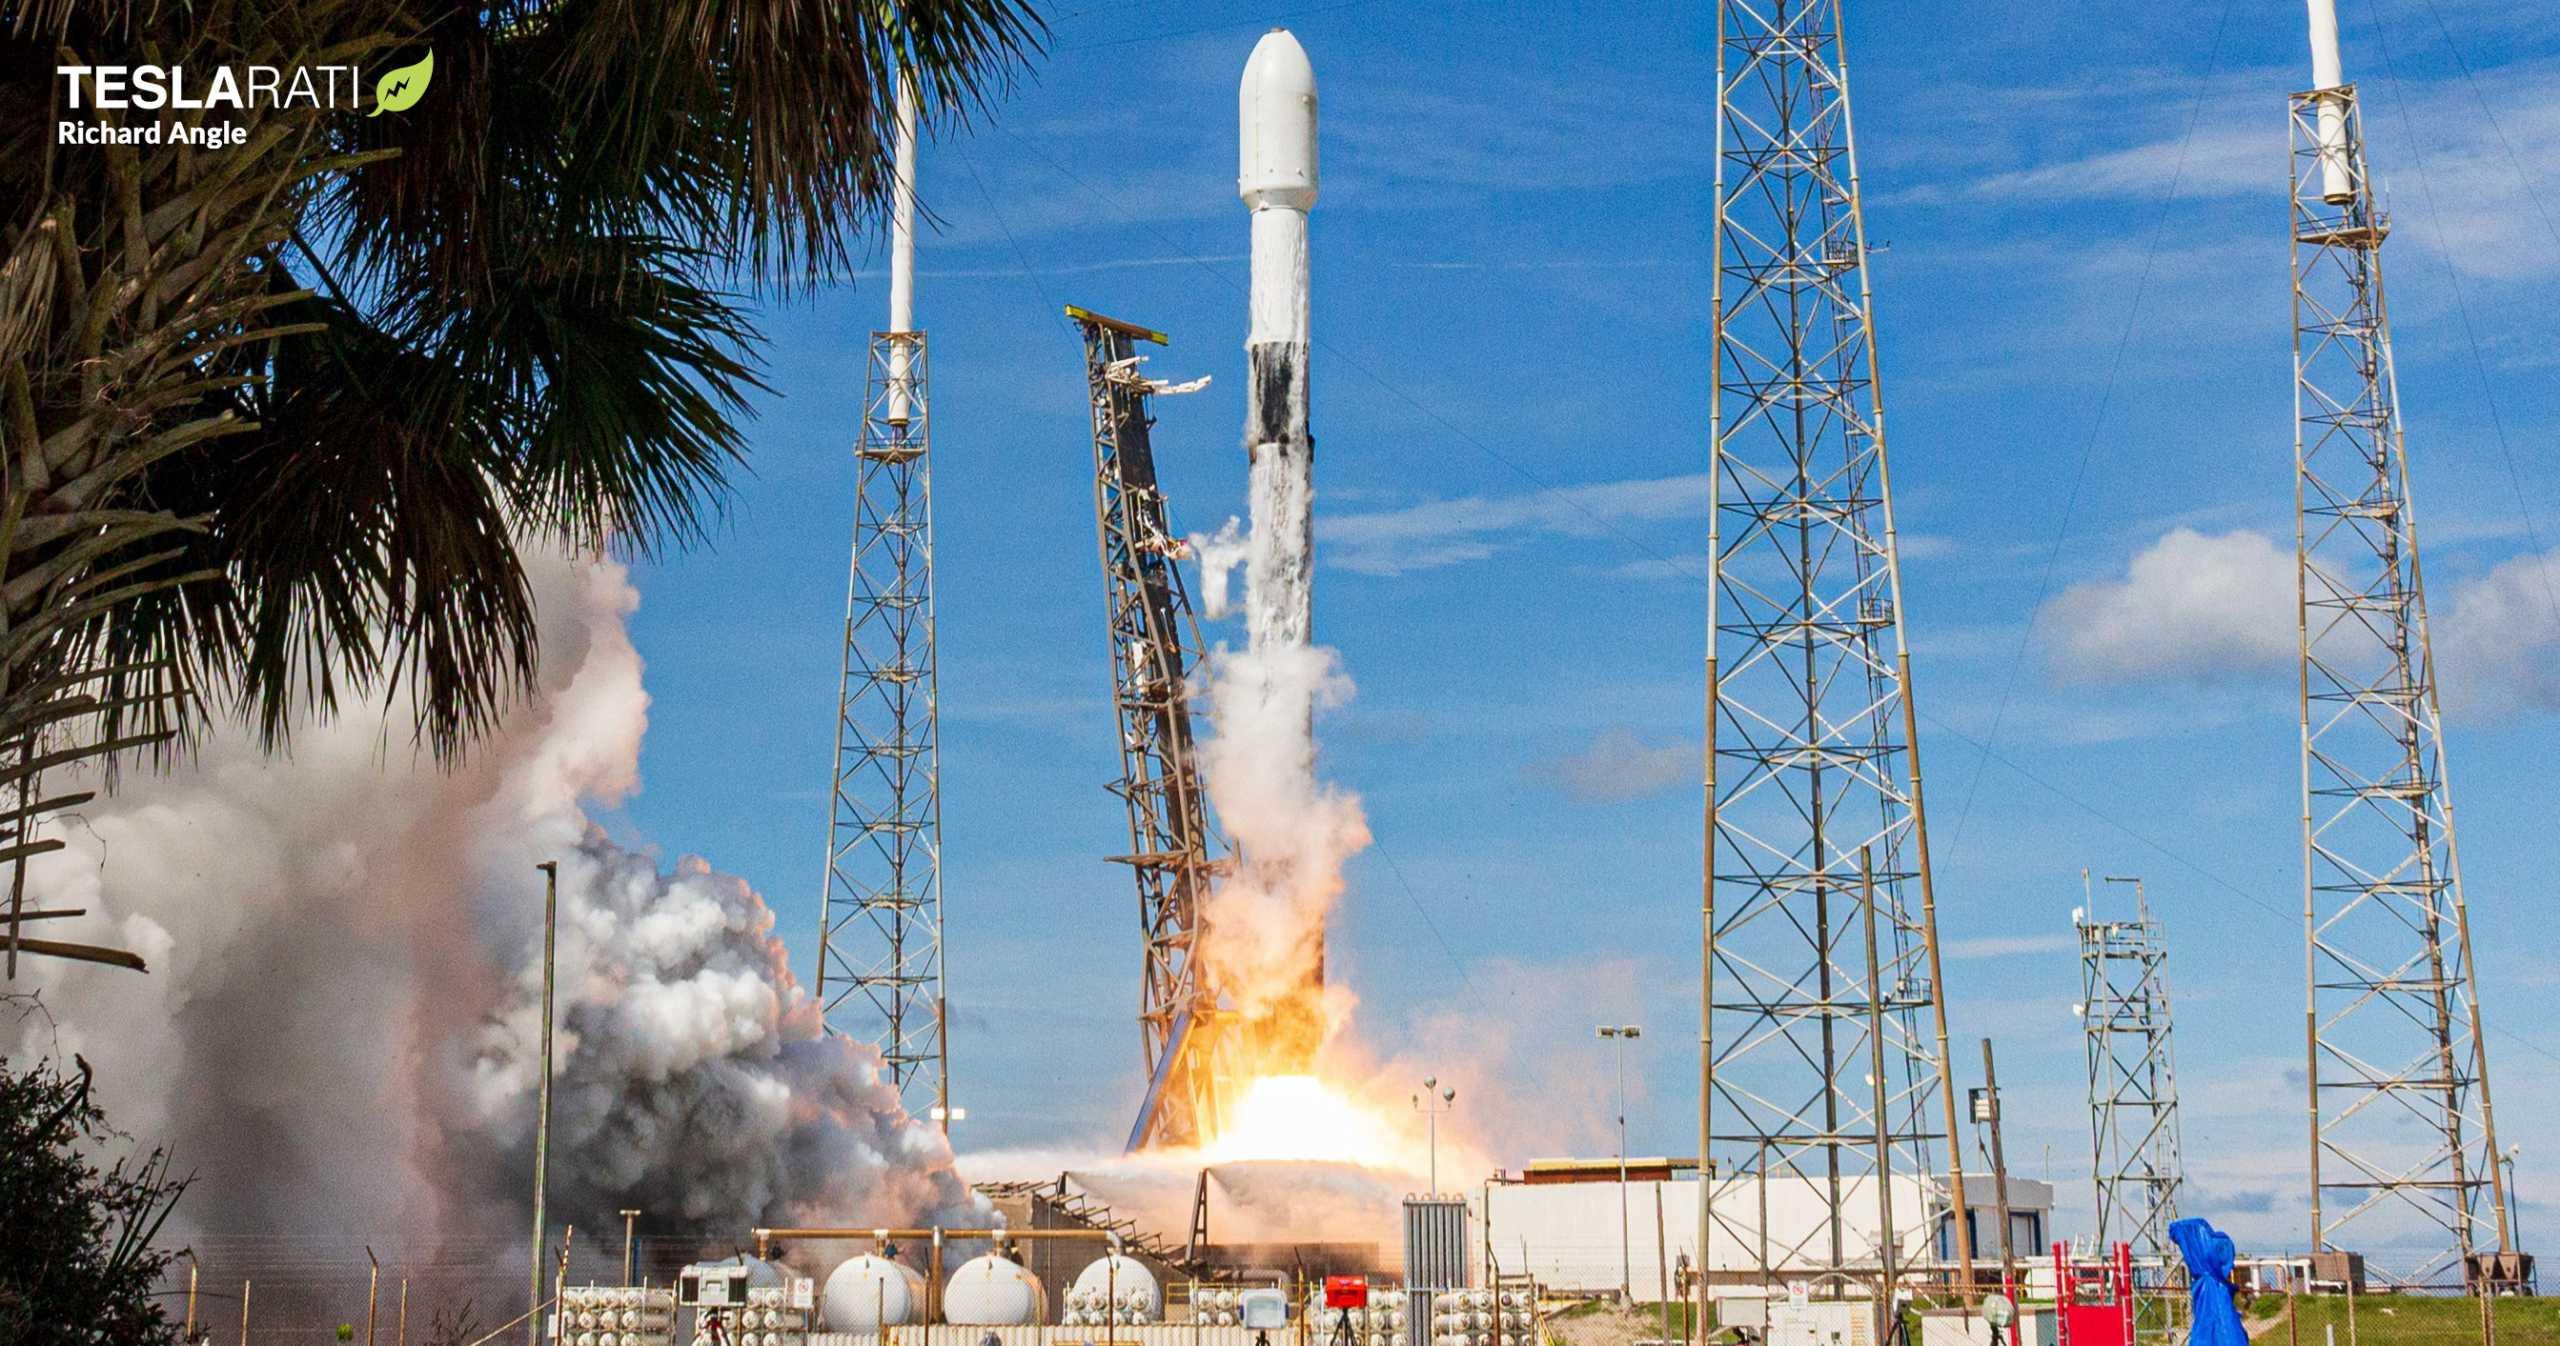 Starlink-10 SkySat Falcon 9 B1049 081820 (Richard Angle) launch 6 crop (c)